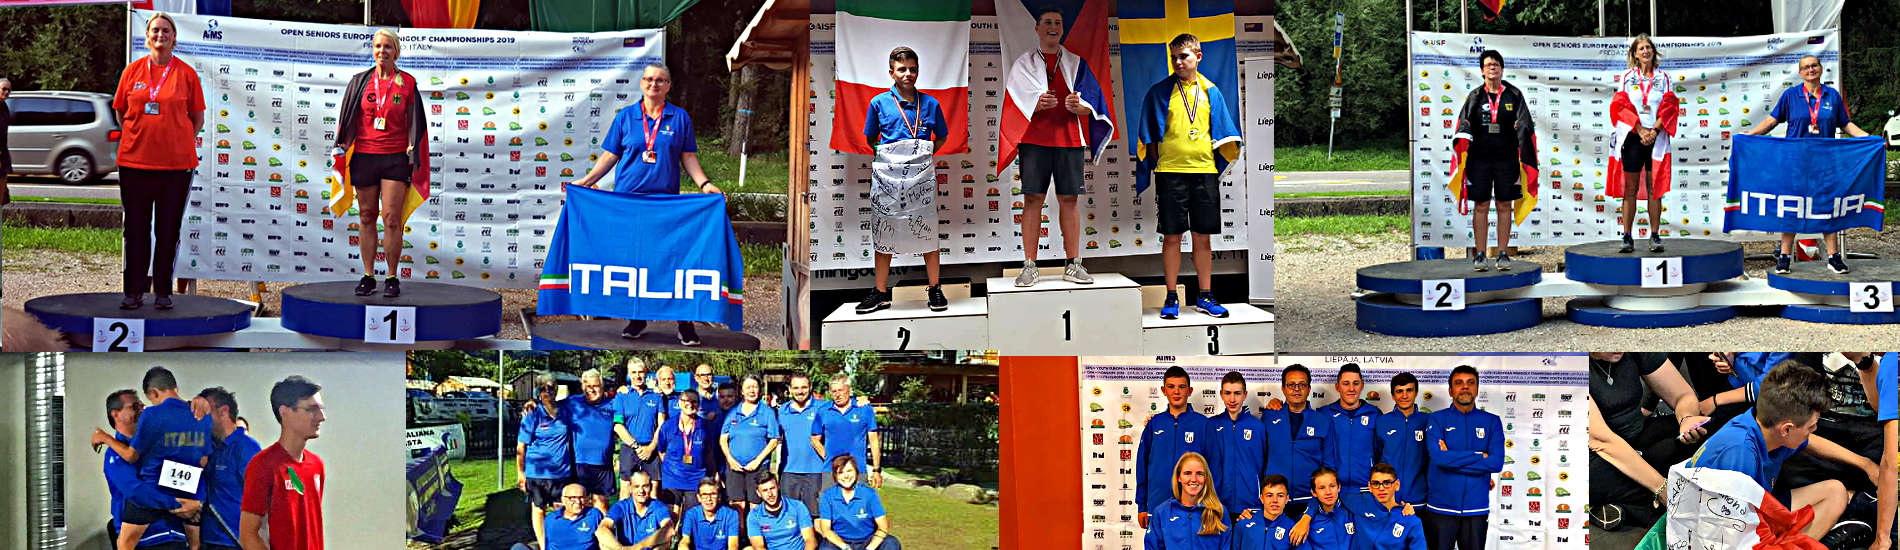 Tre medaglie agli Europei Junior e Senior 2019